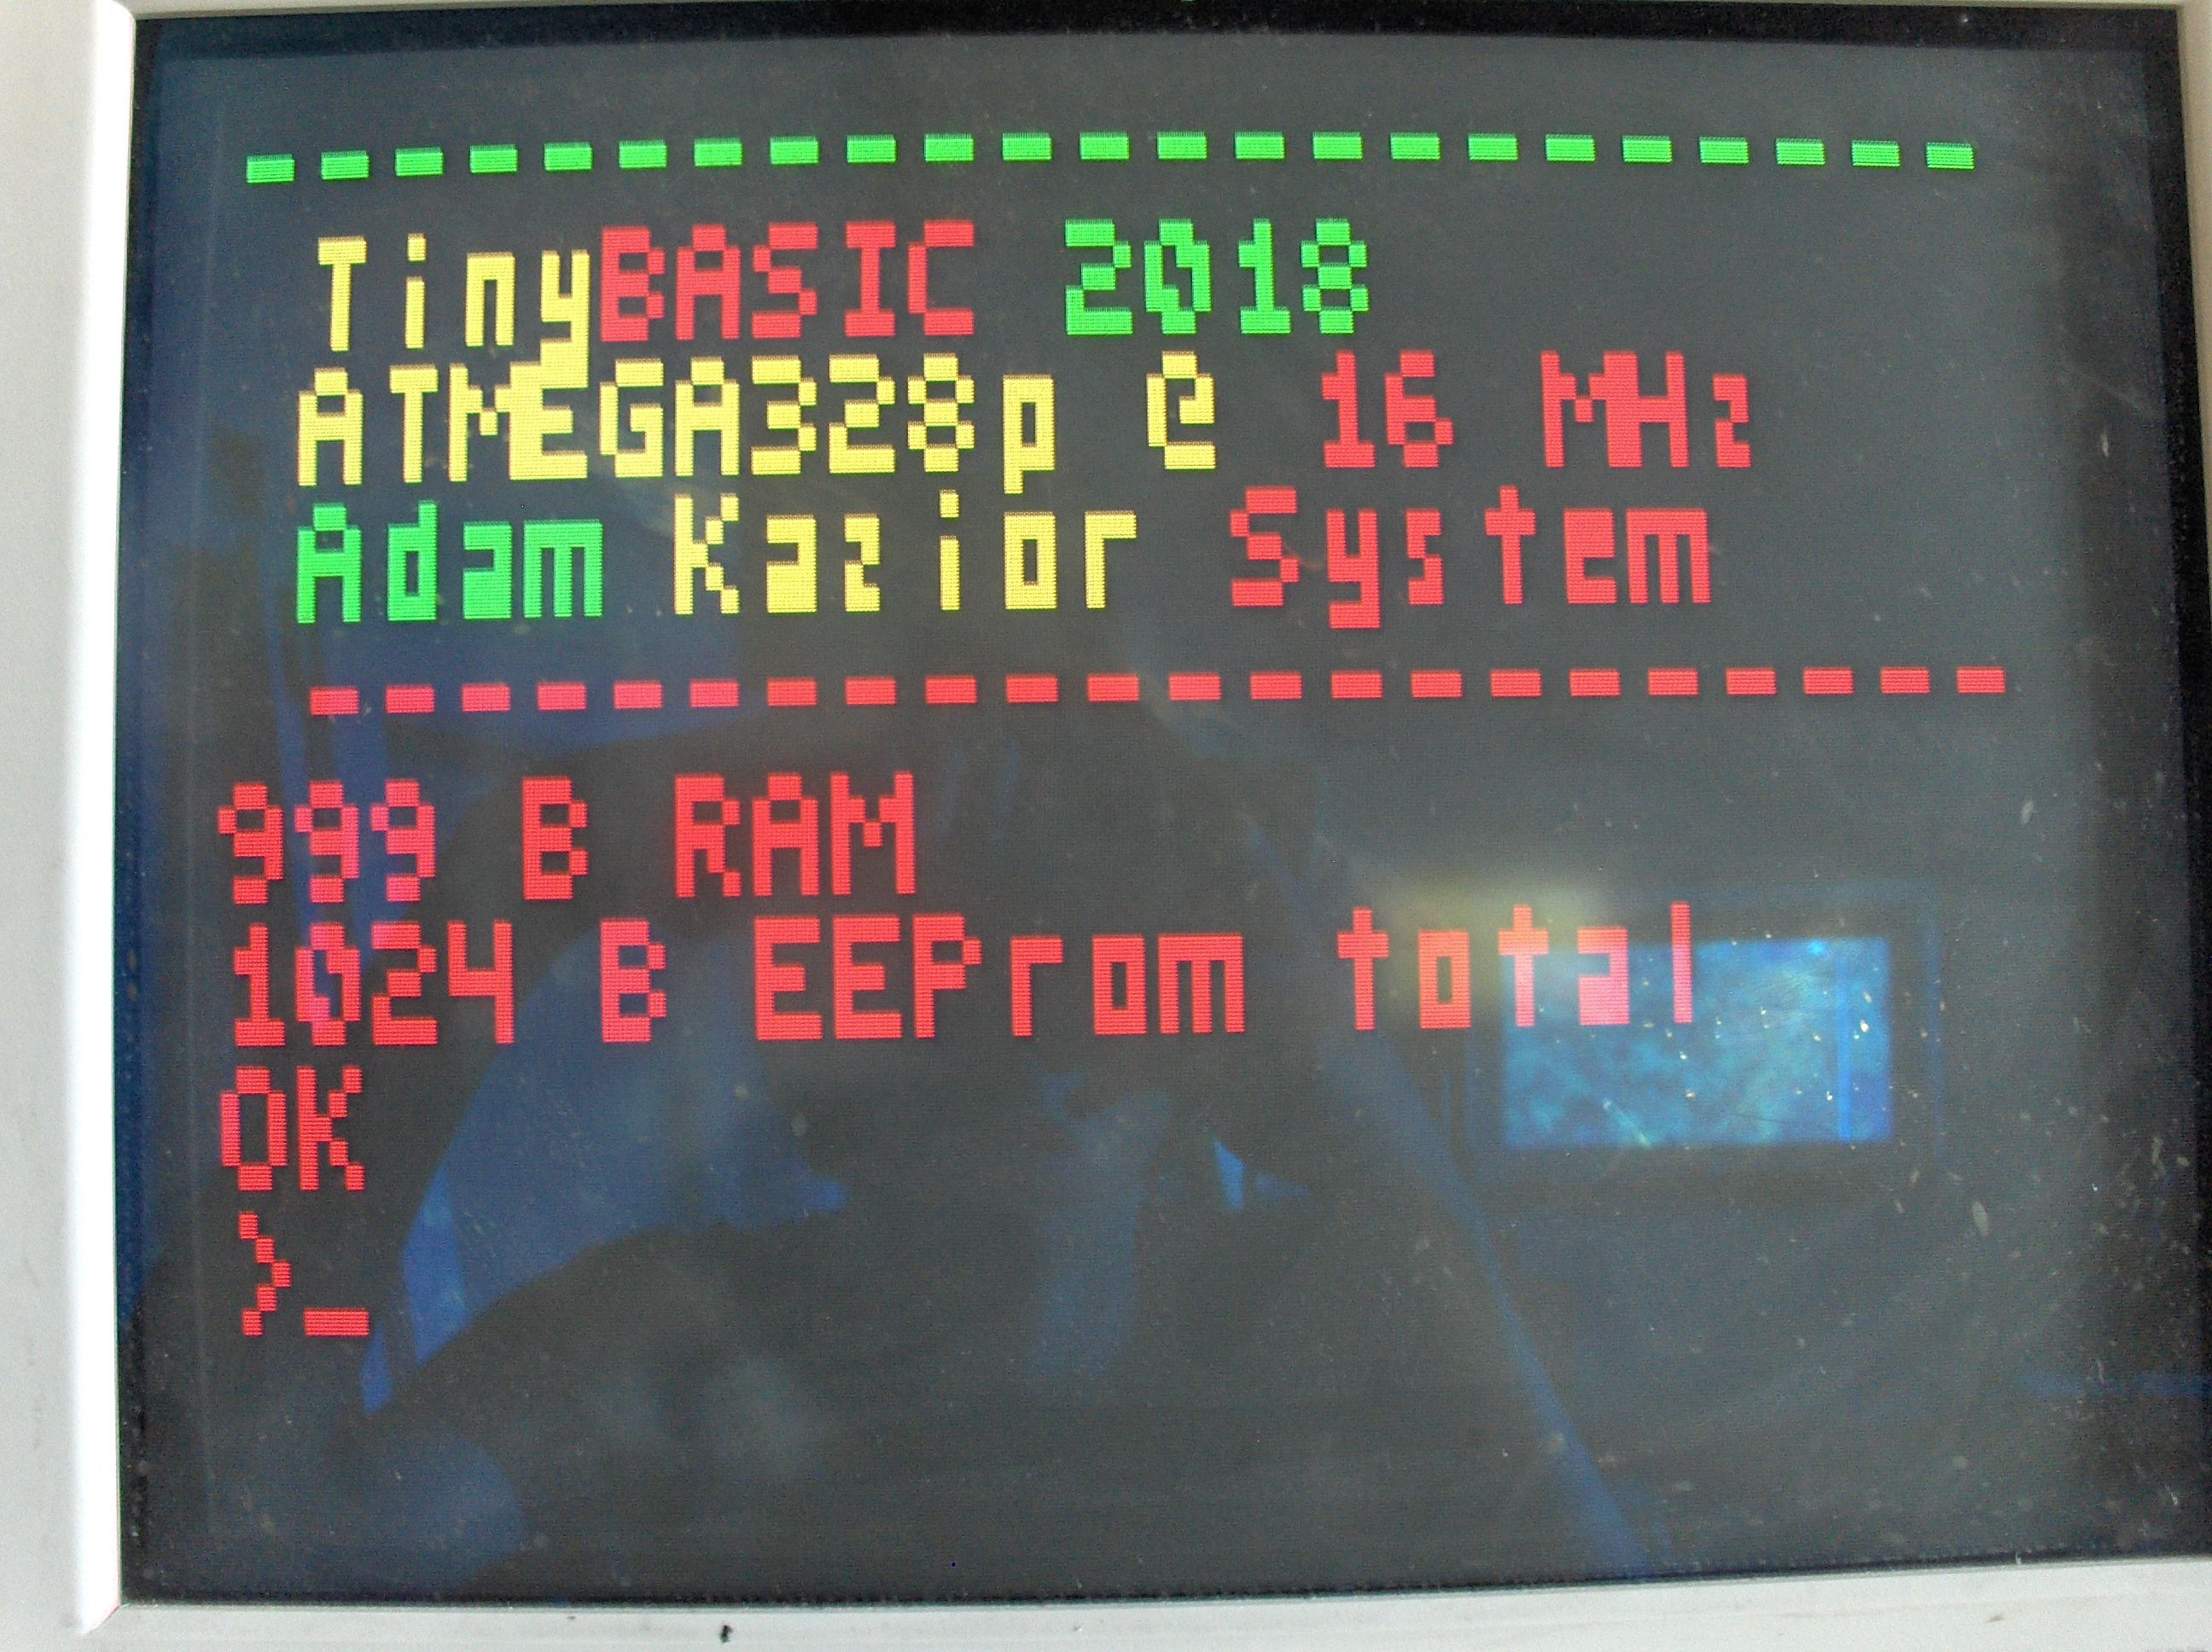 Graphic card test : VGA 120x60 Atmega328 @ 16MHz In the